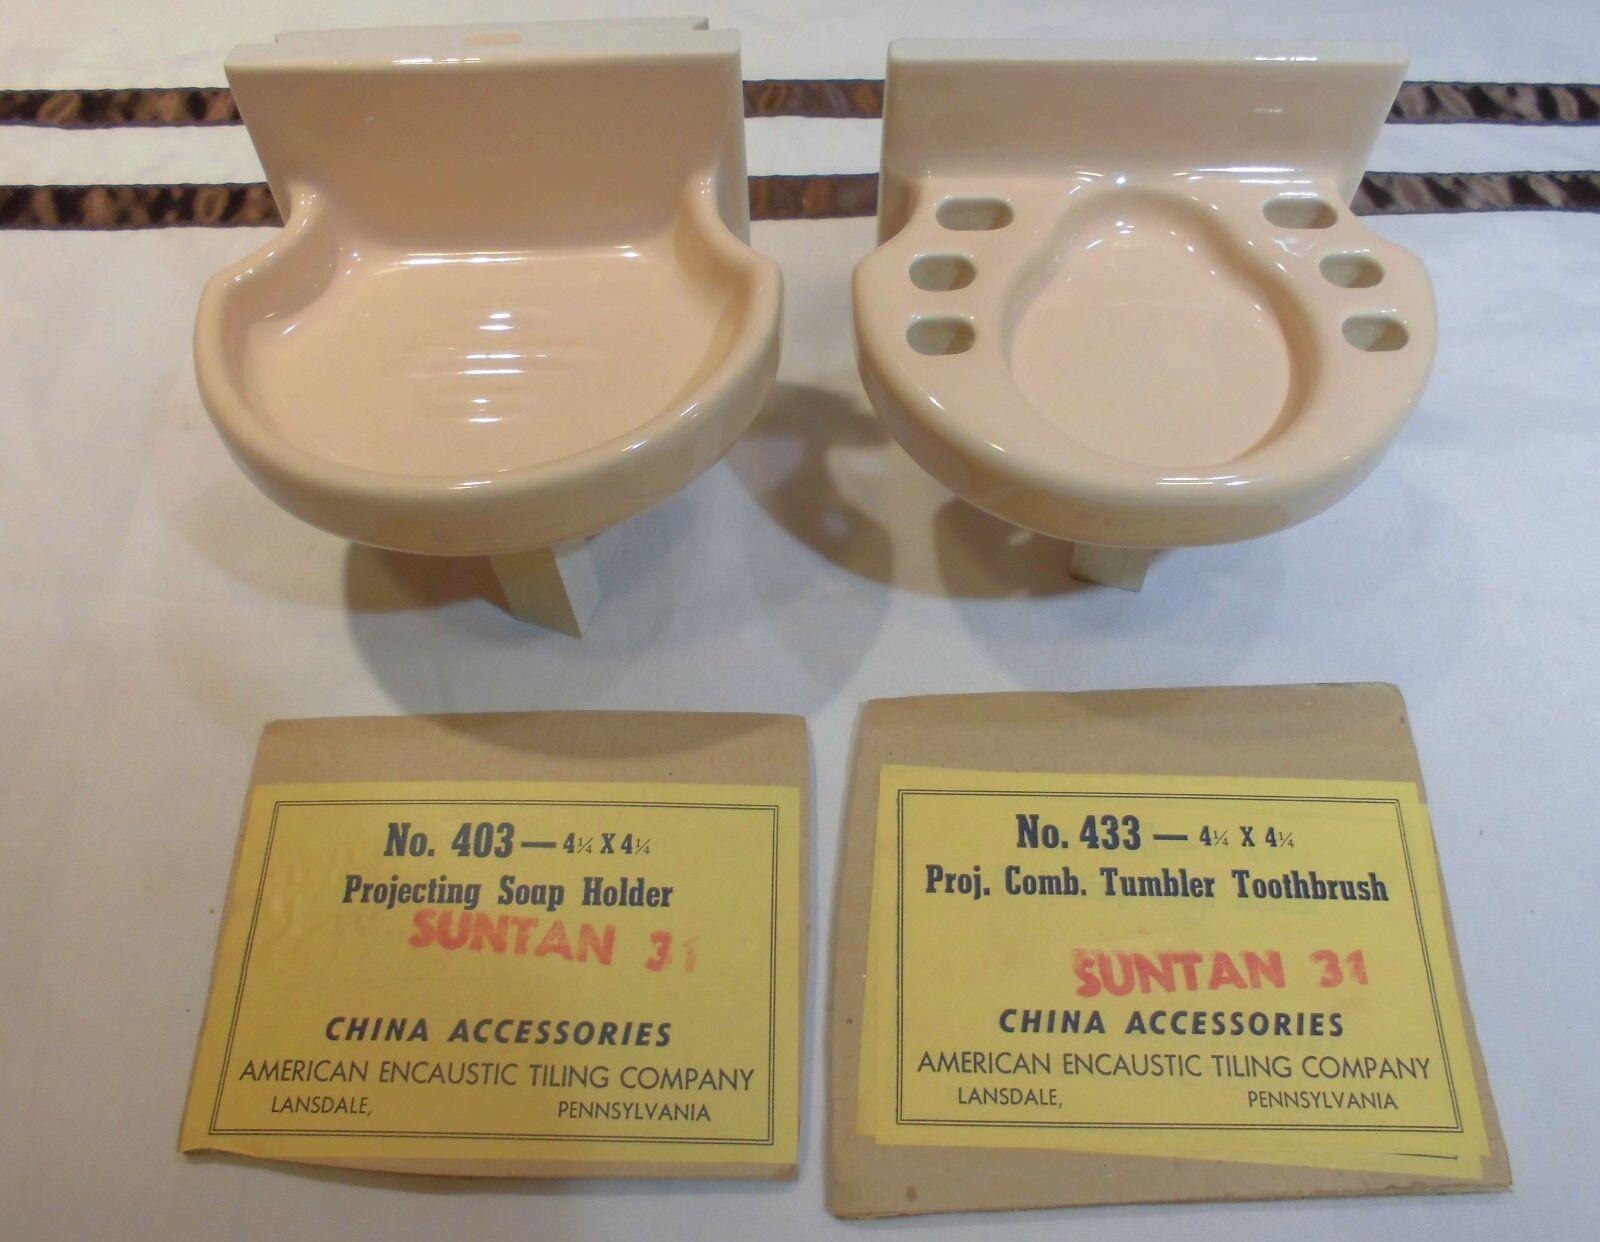 Vintage Peach-Beige Sink Set ceramic soap dish & cup holder by American Olean